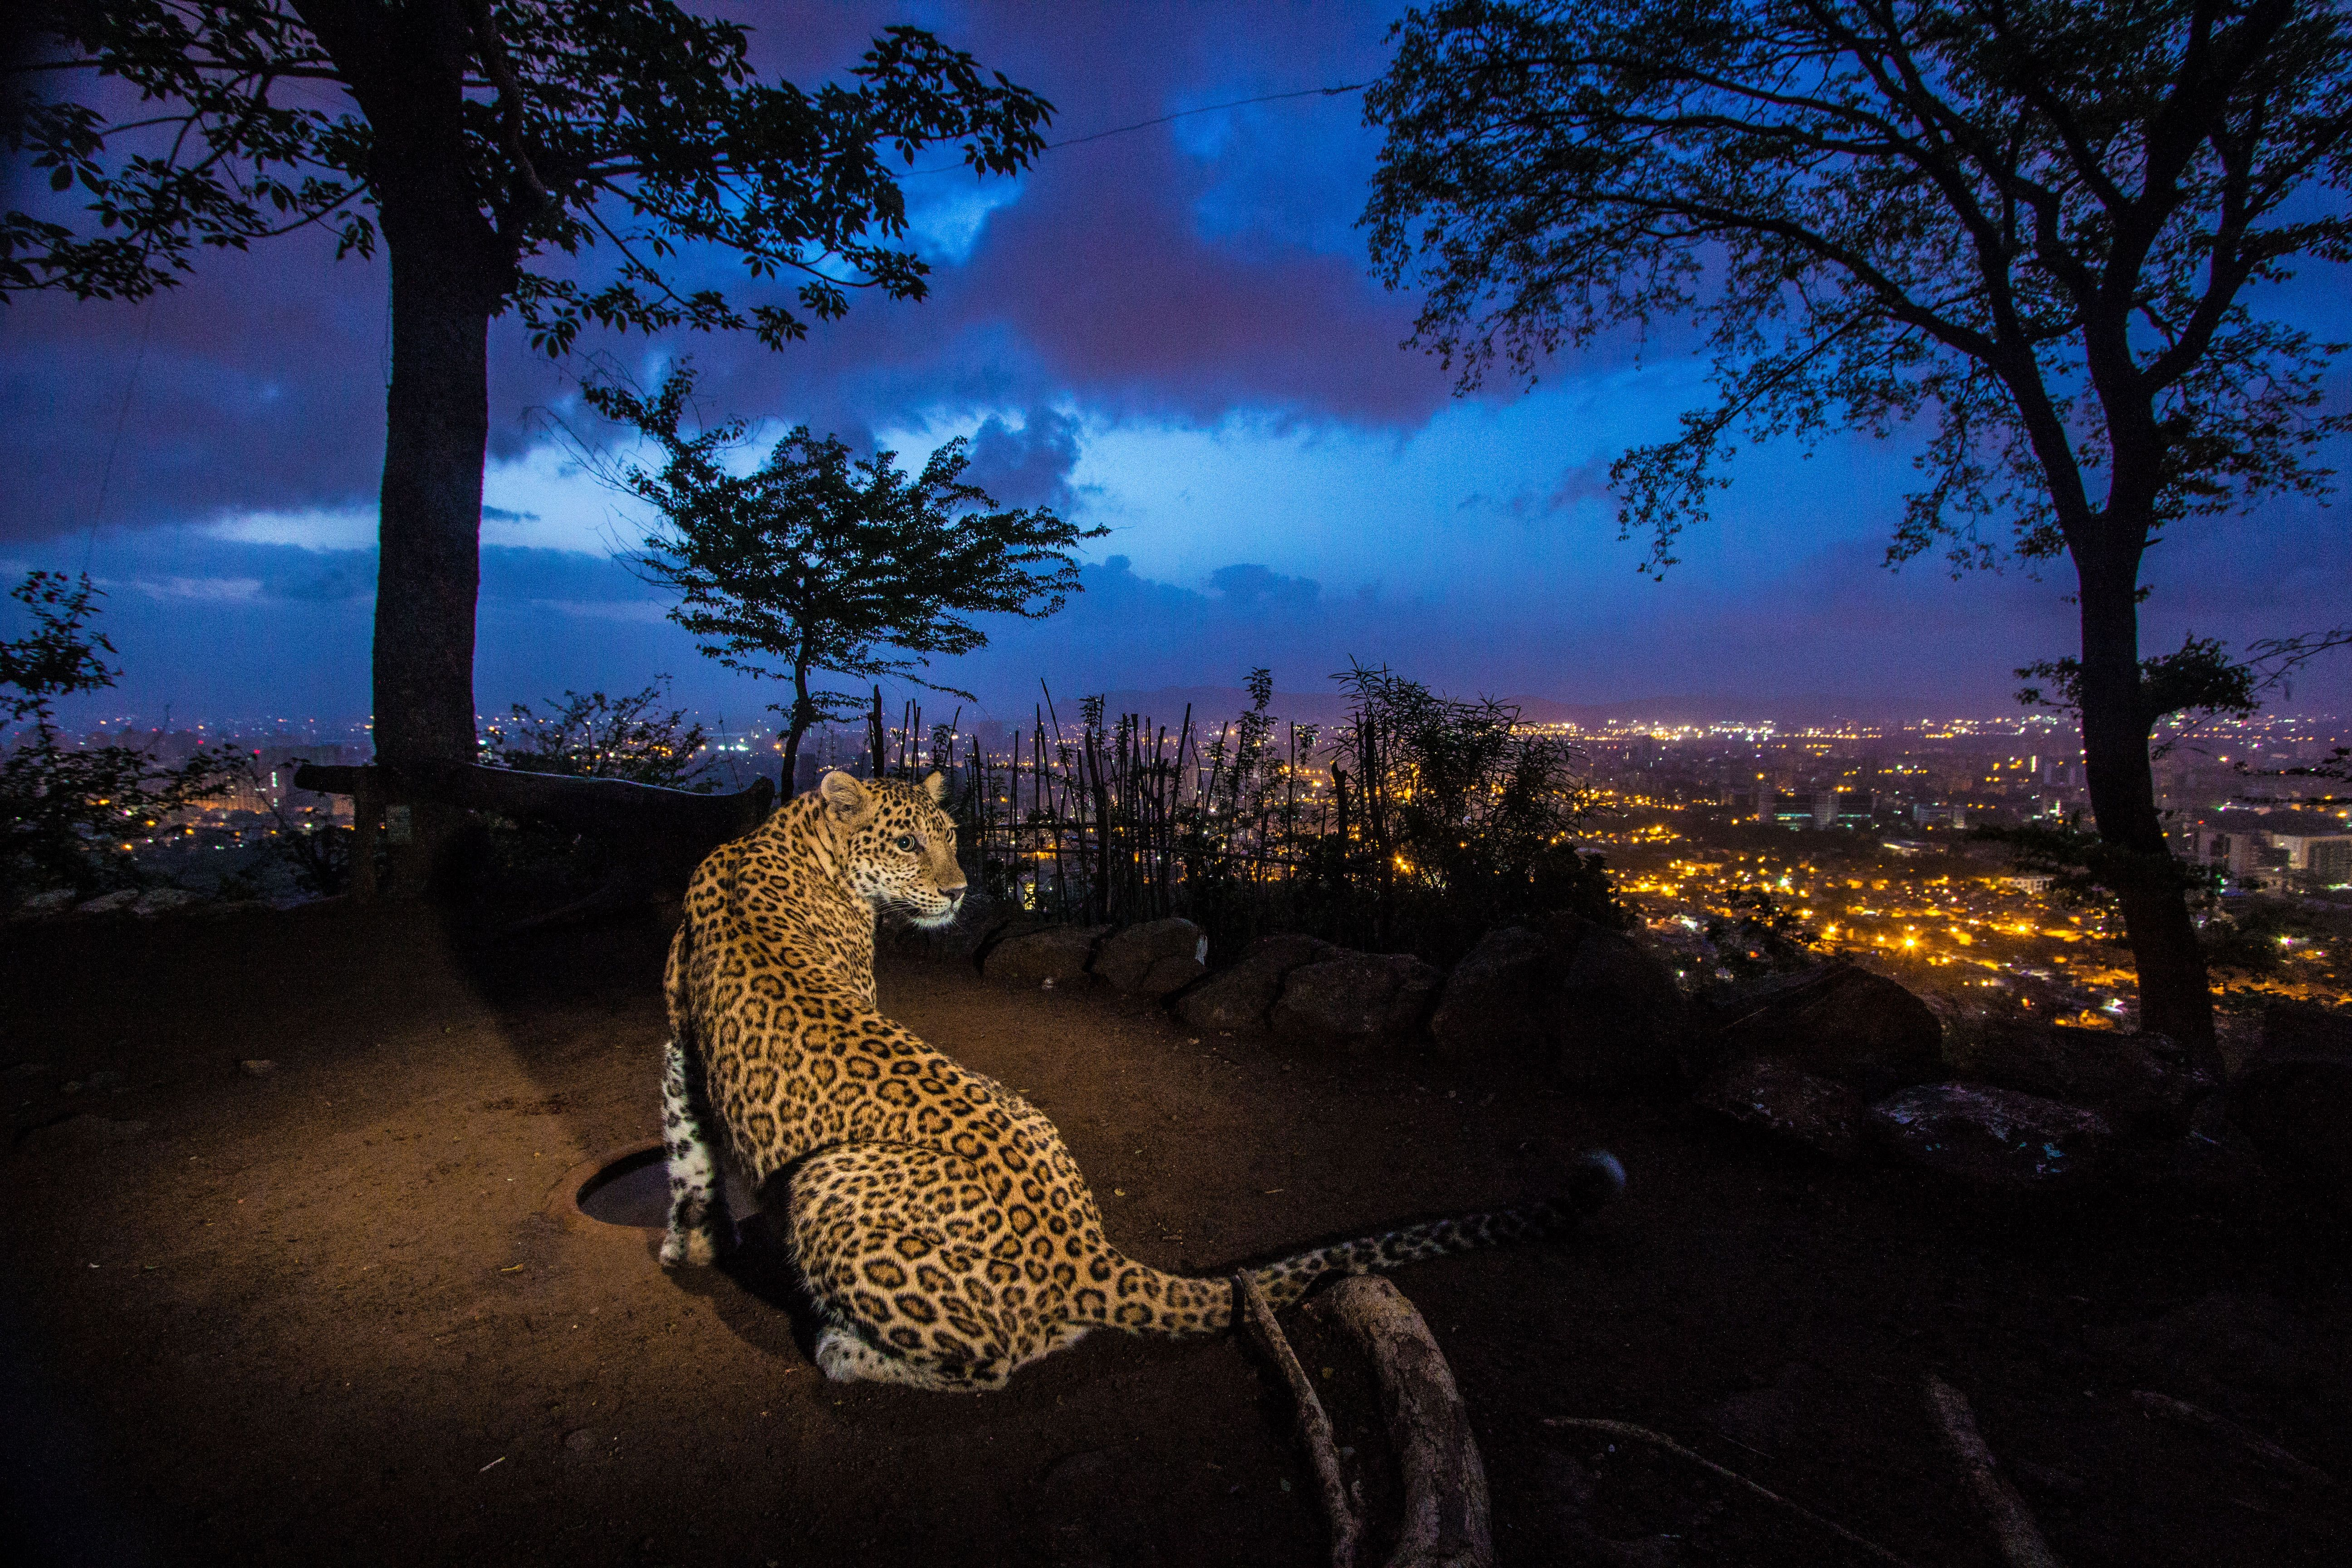 Shrinking Kingdoms: Leopards & Jaguars - National Geographic Museum 2018-05-01 15:04